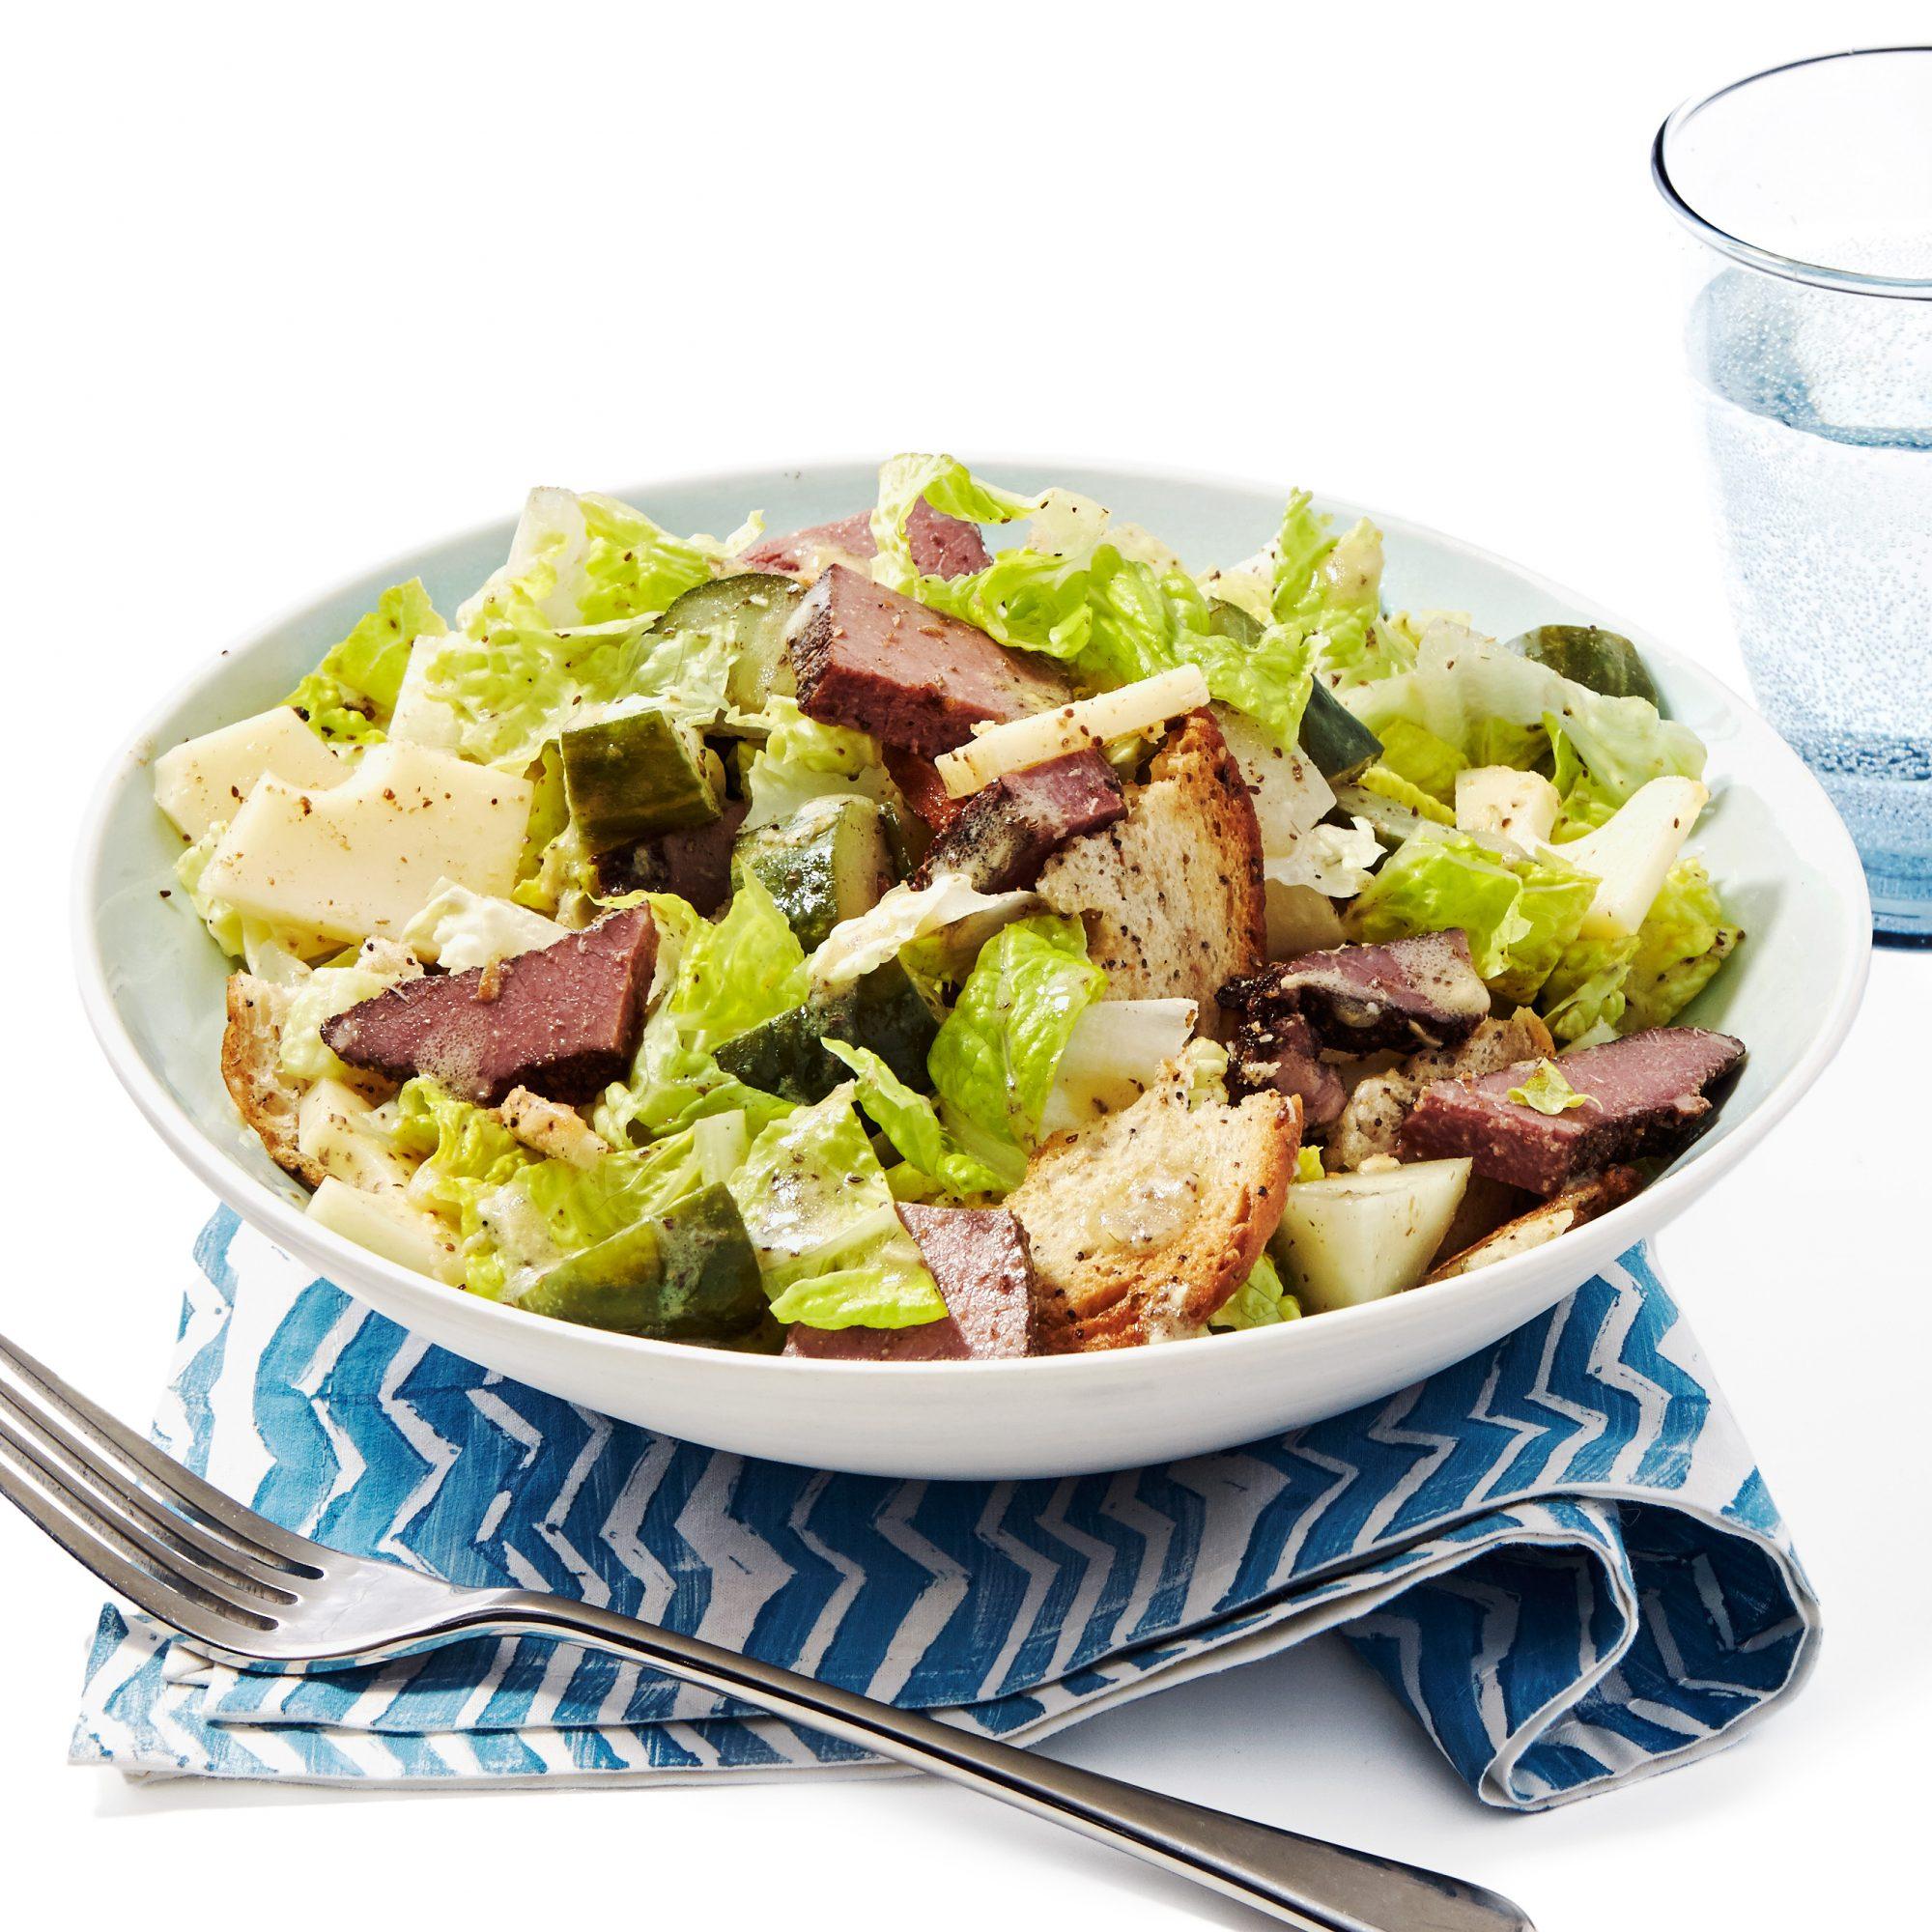 new york deli salad